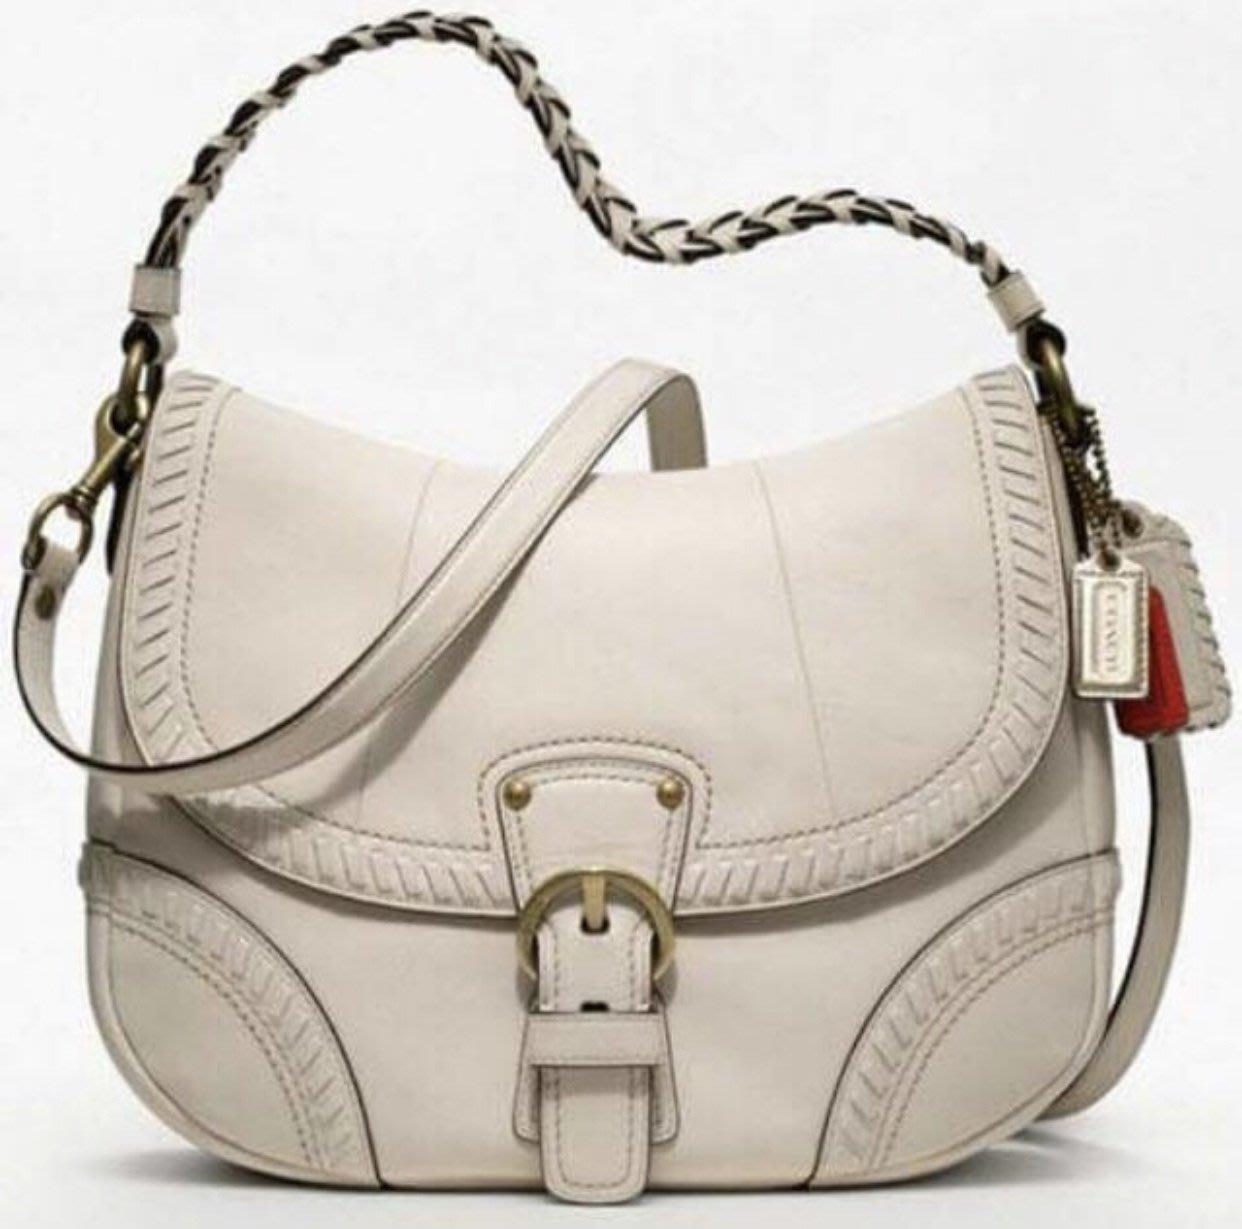 COACH POPPY系列 米白色  肩背包 斜背包 兩用包 全新 現貨